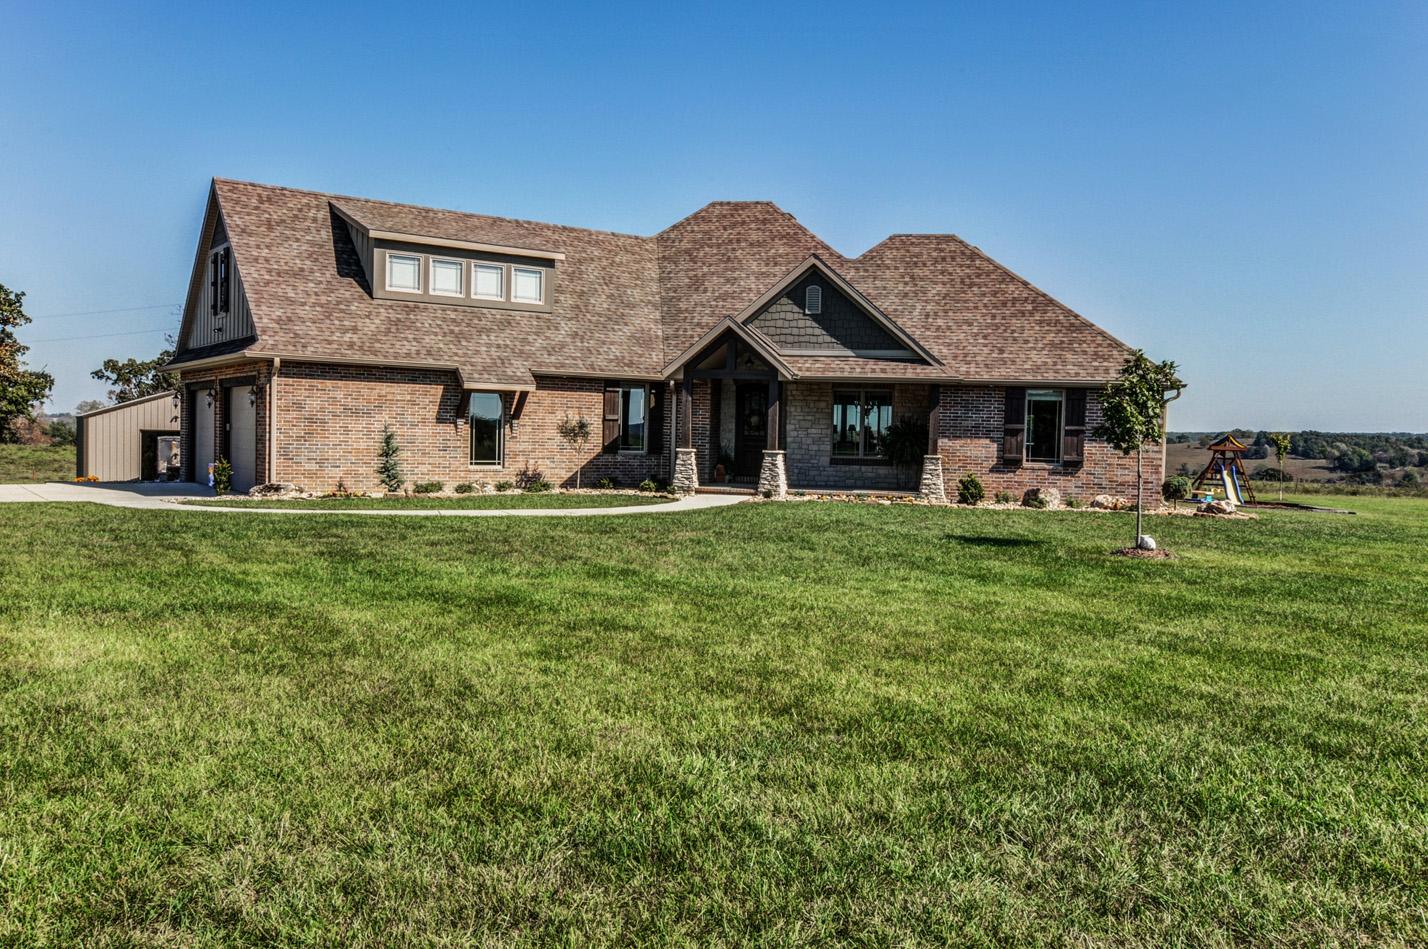 built-by-brett-custom-home-springfield-mo-rte-353-ww-001.jpg